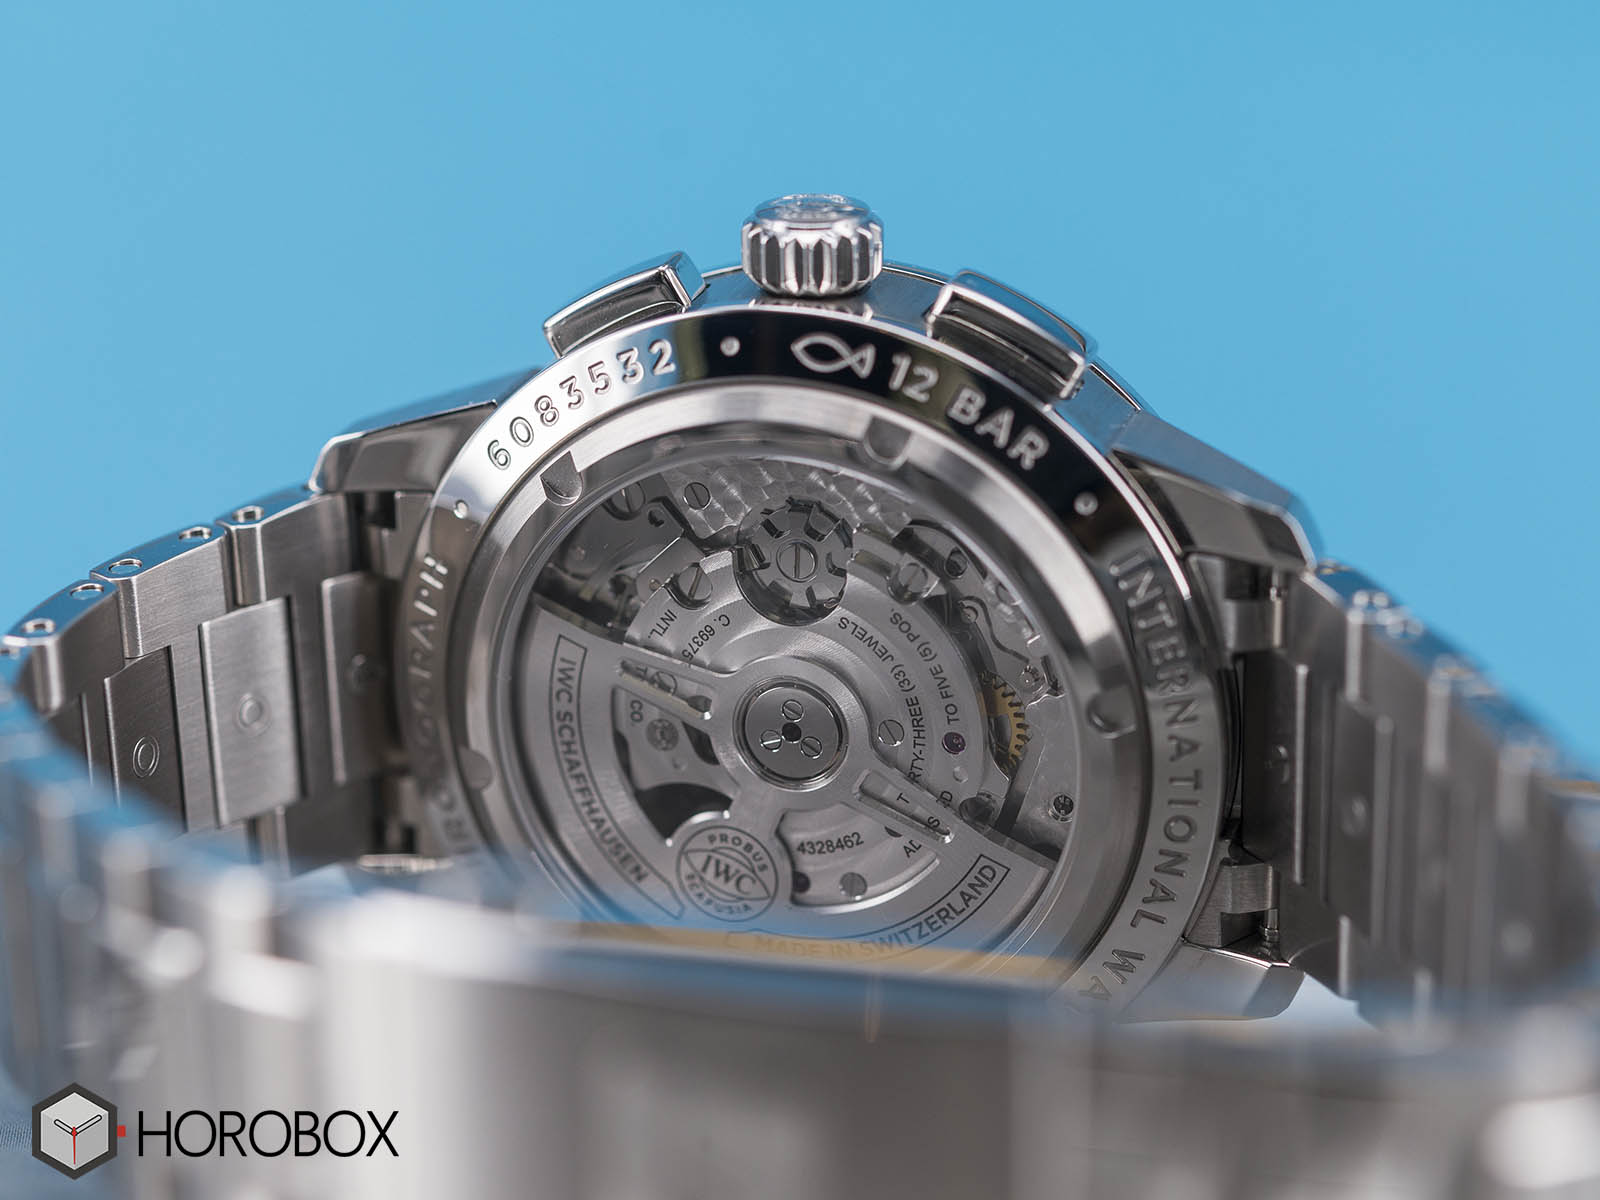 iwc-ingenieur-chronograph-W380802-7-.jpg